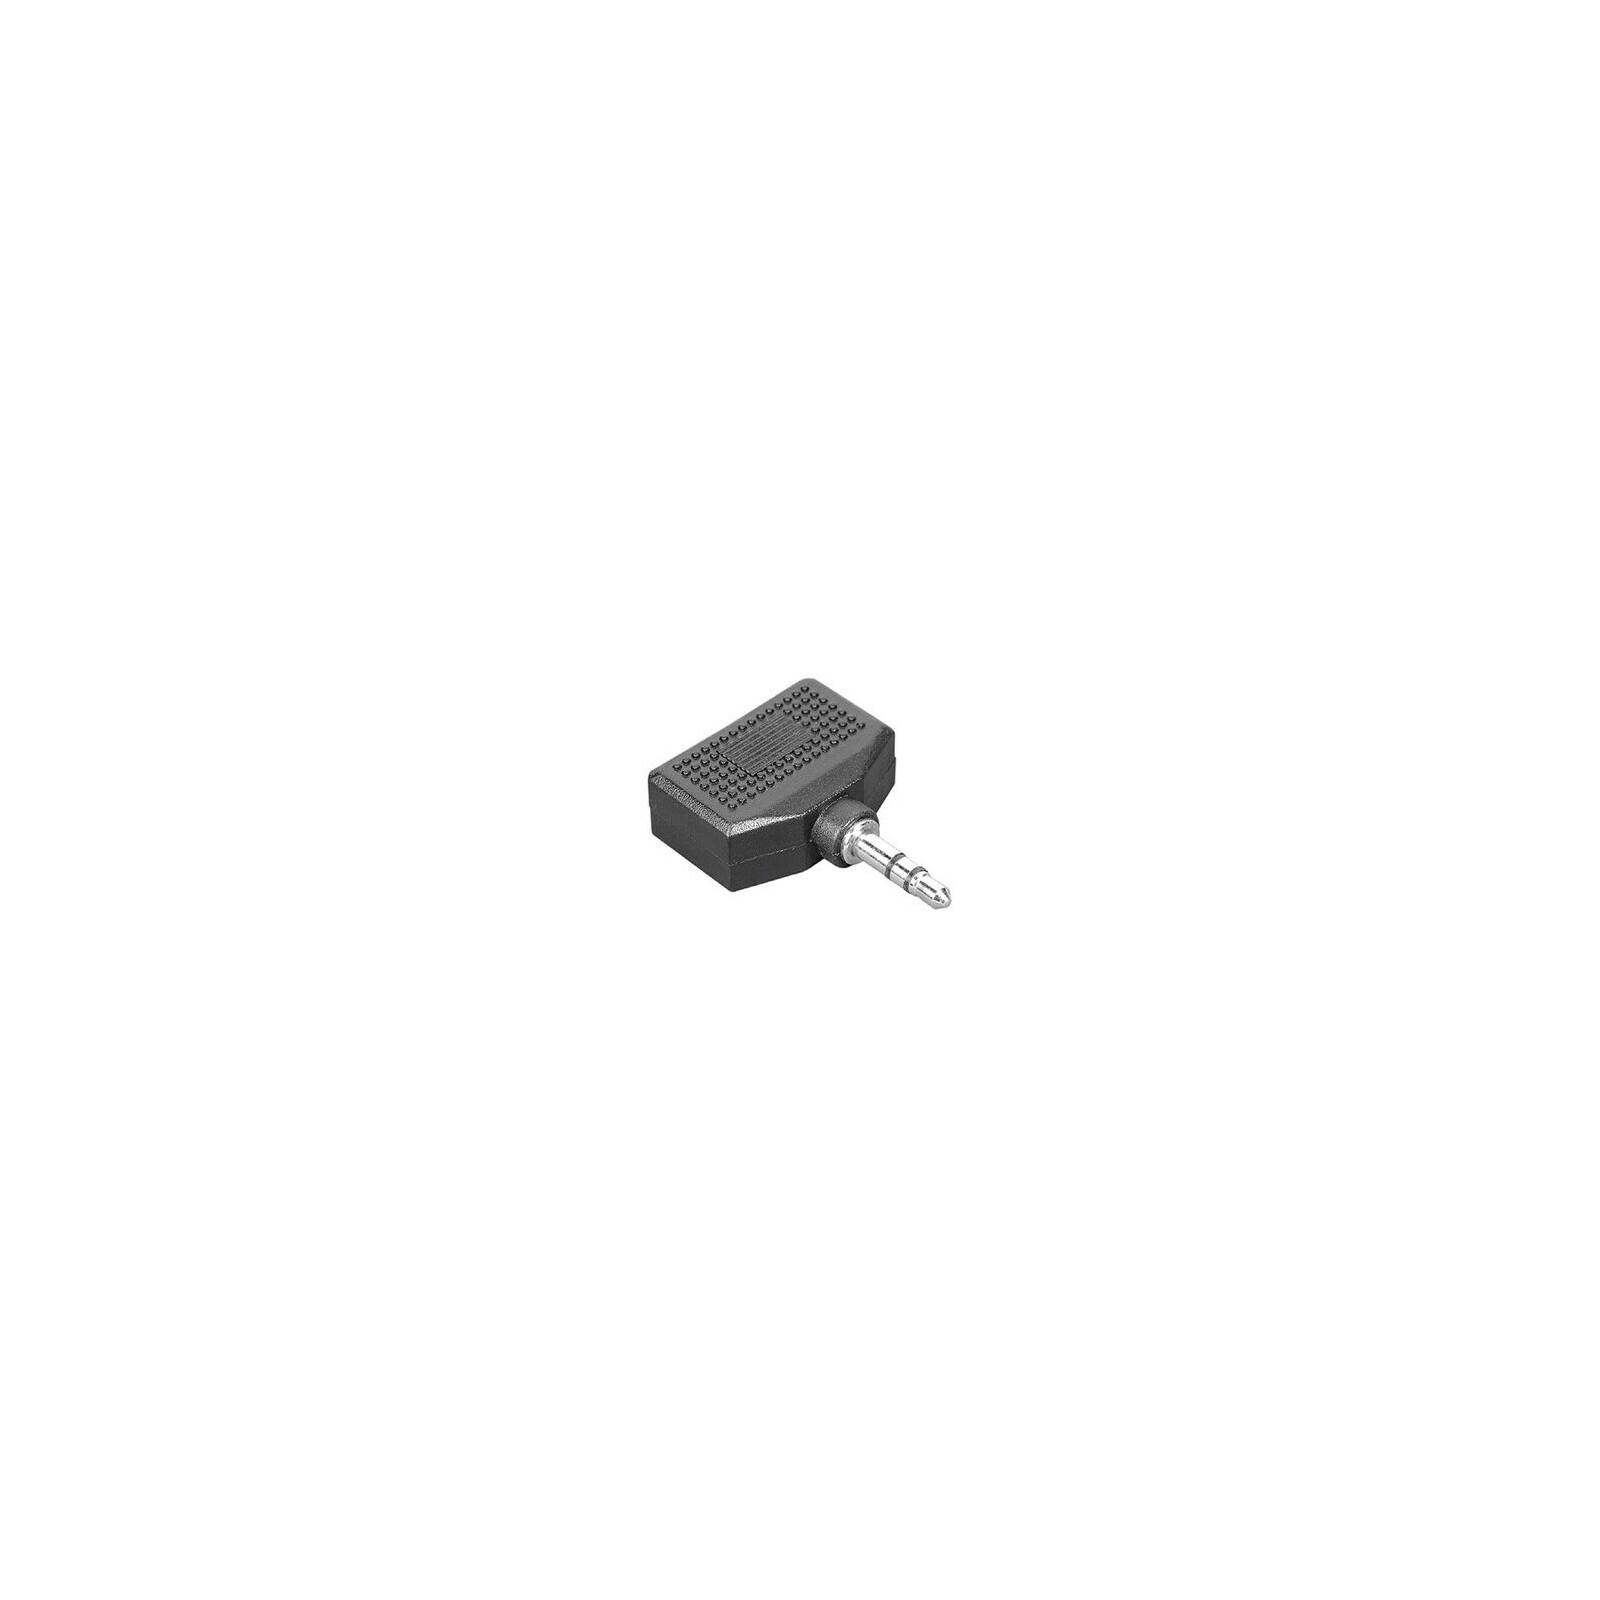 Hama 43353 Audio-Adapter 3,5-mm-Klinken-St. - 2 x 3,5-mm-Kli